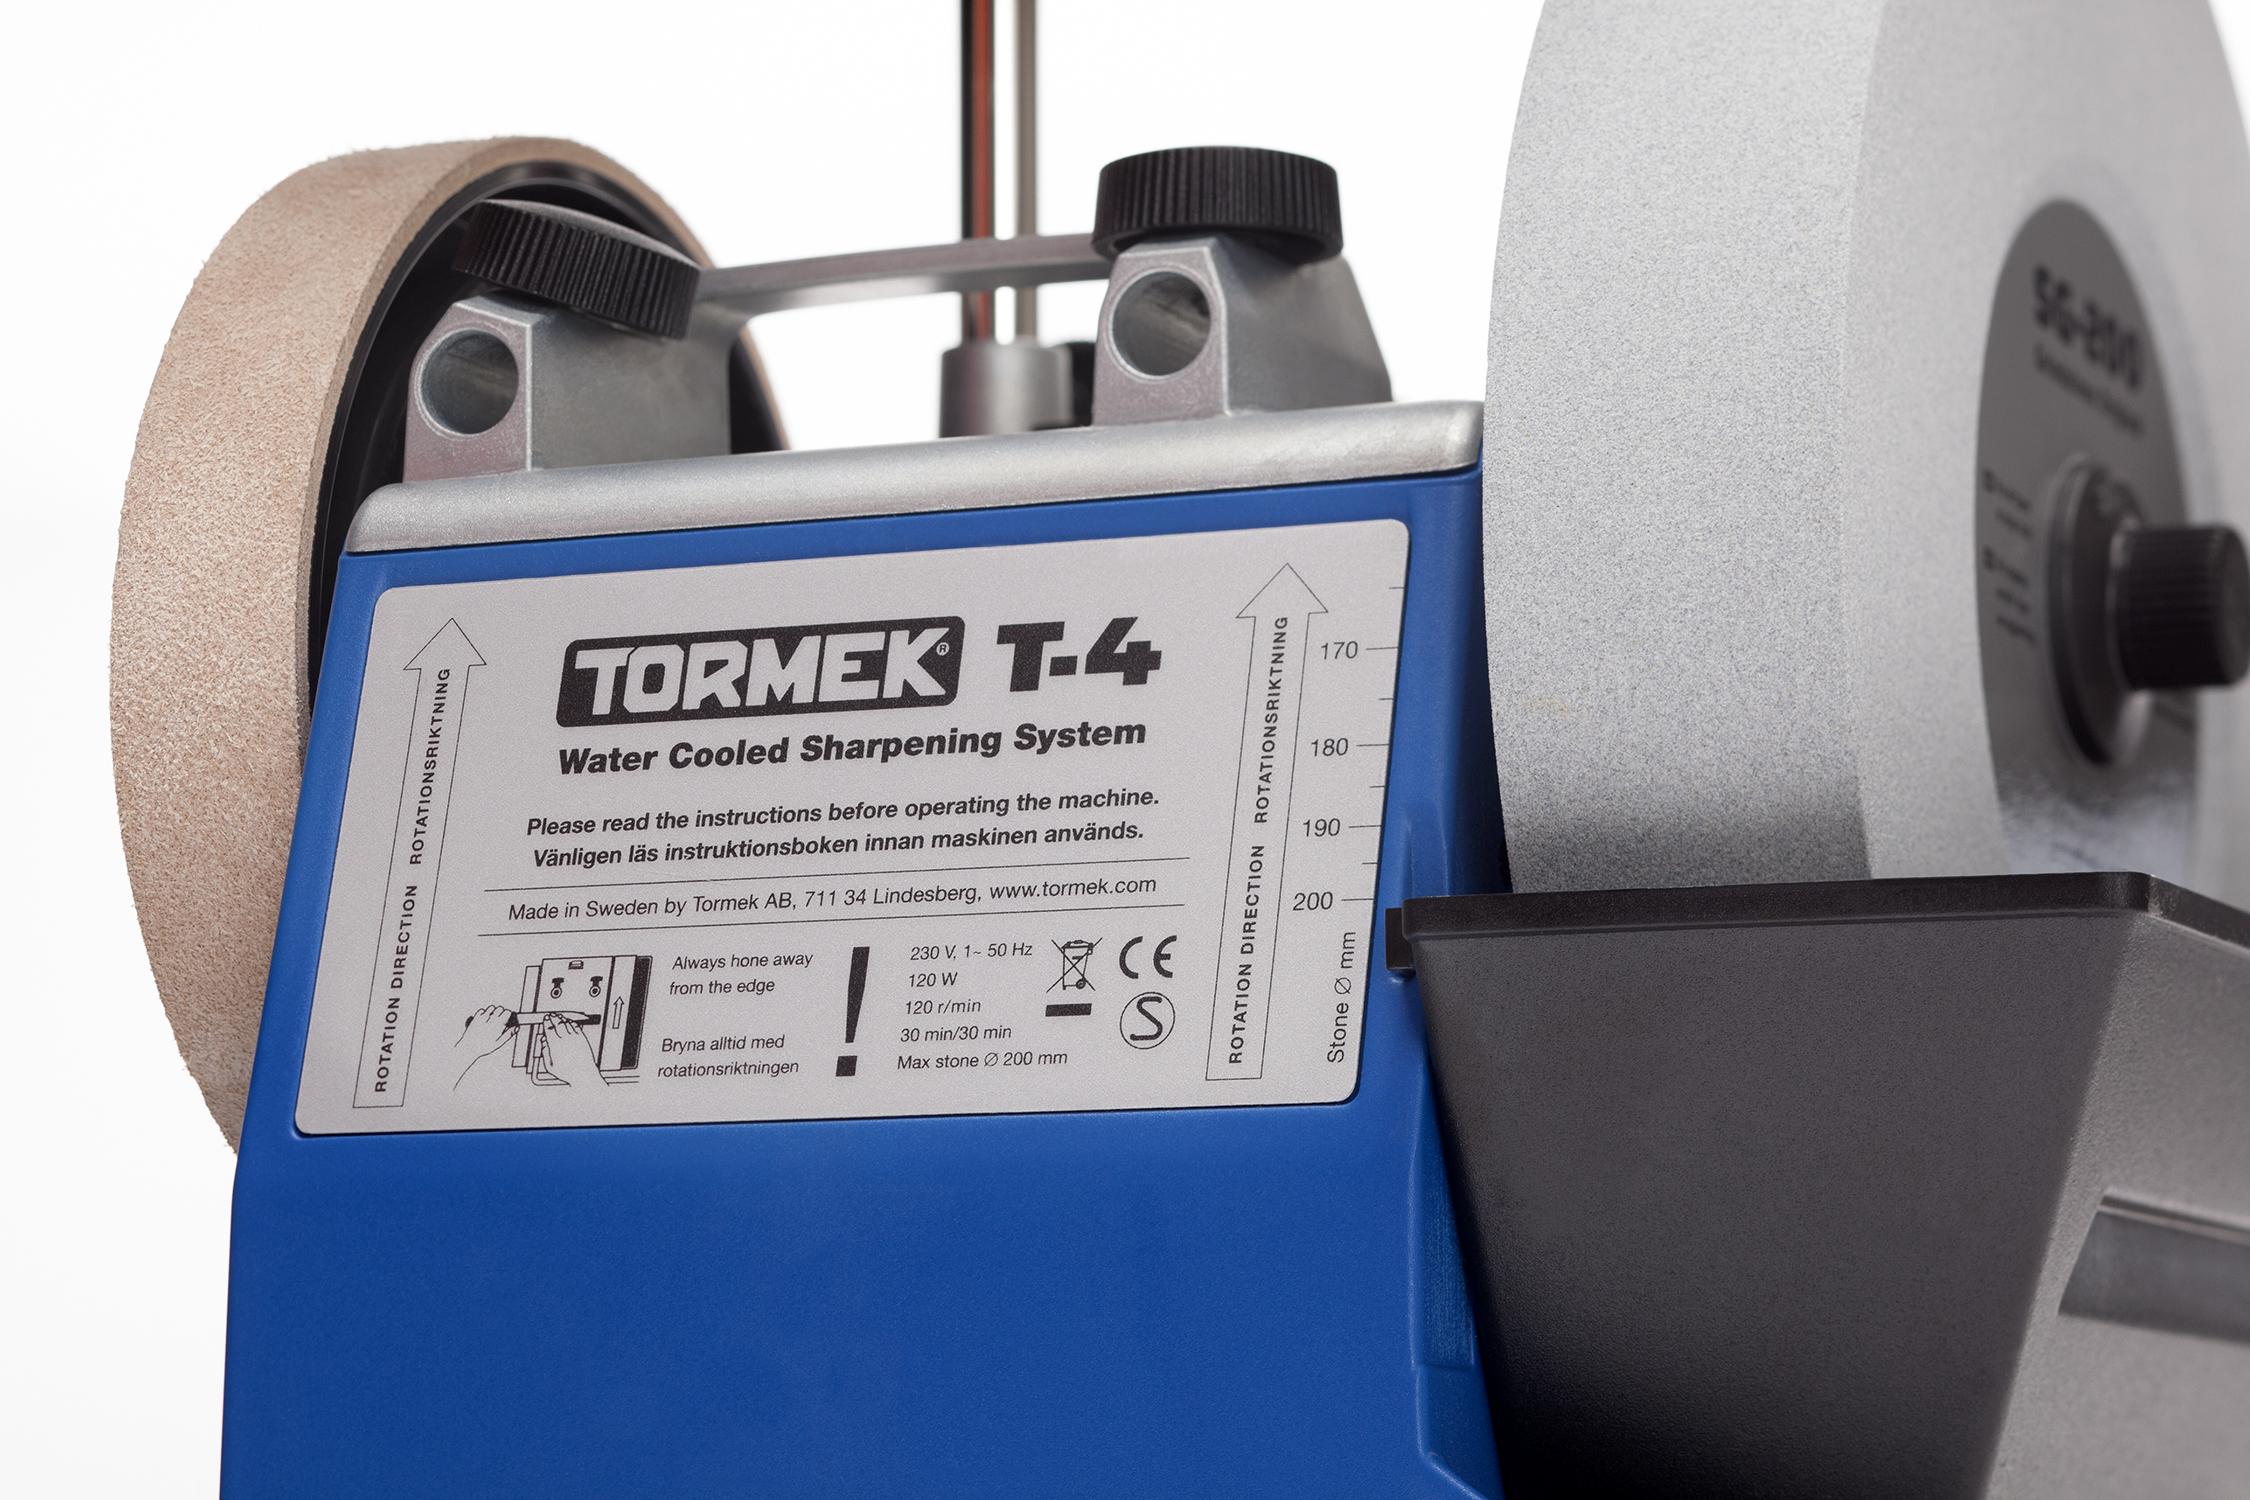 Tormek T-4 detail 4a